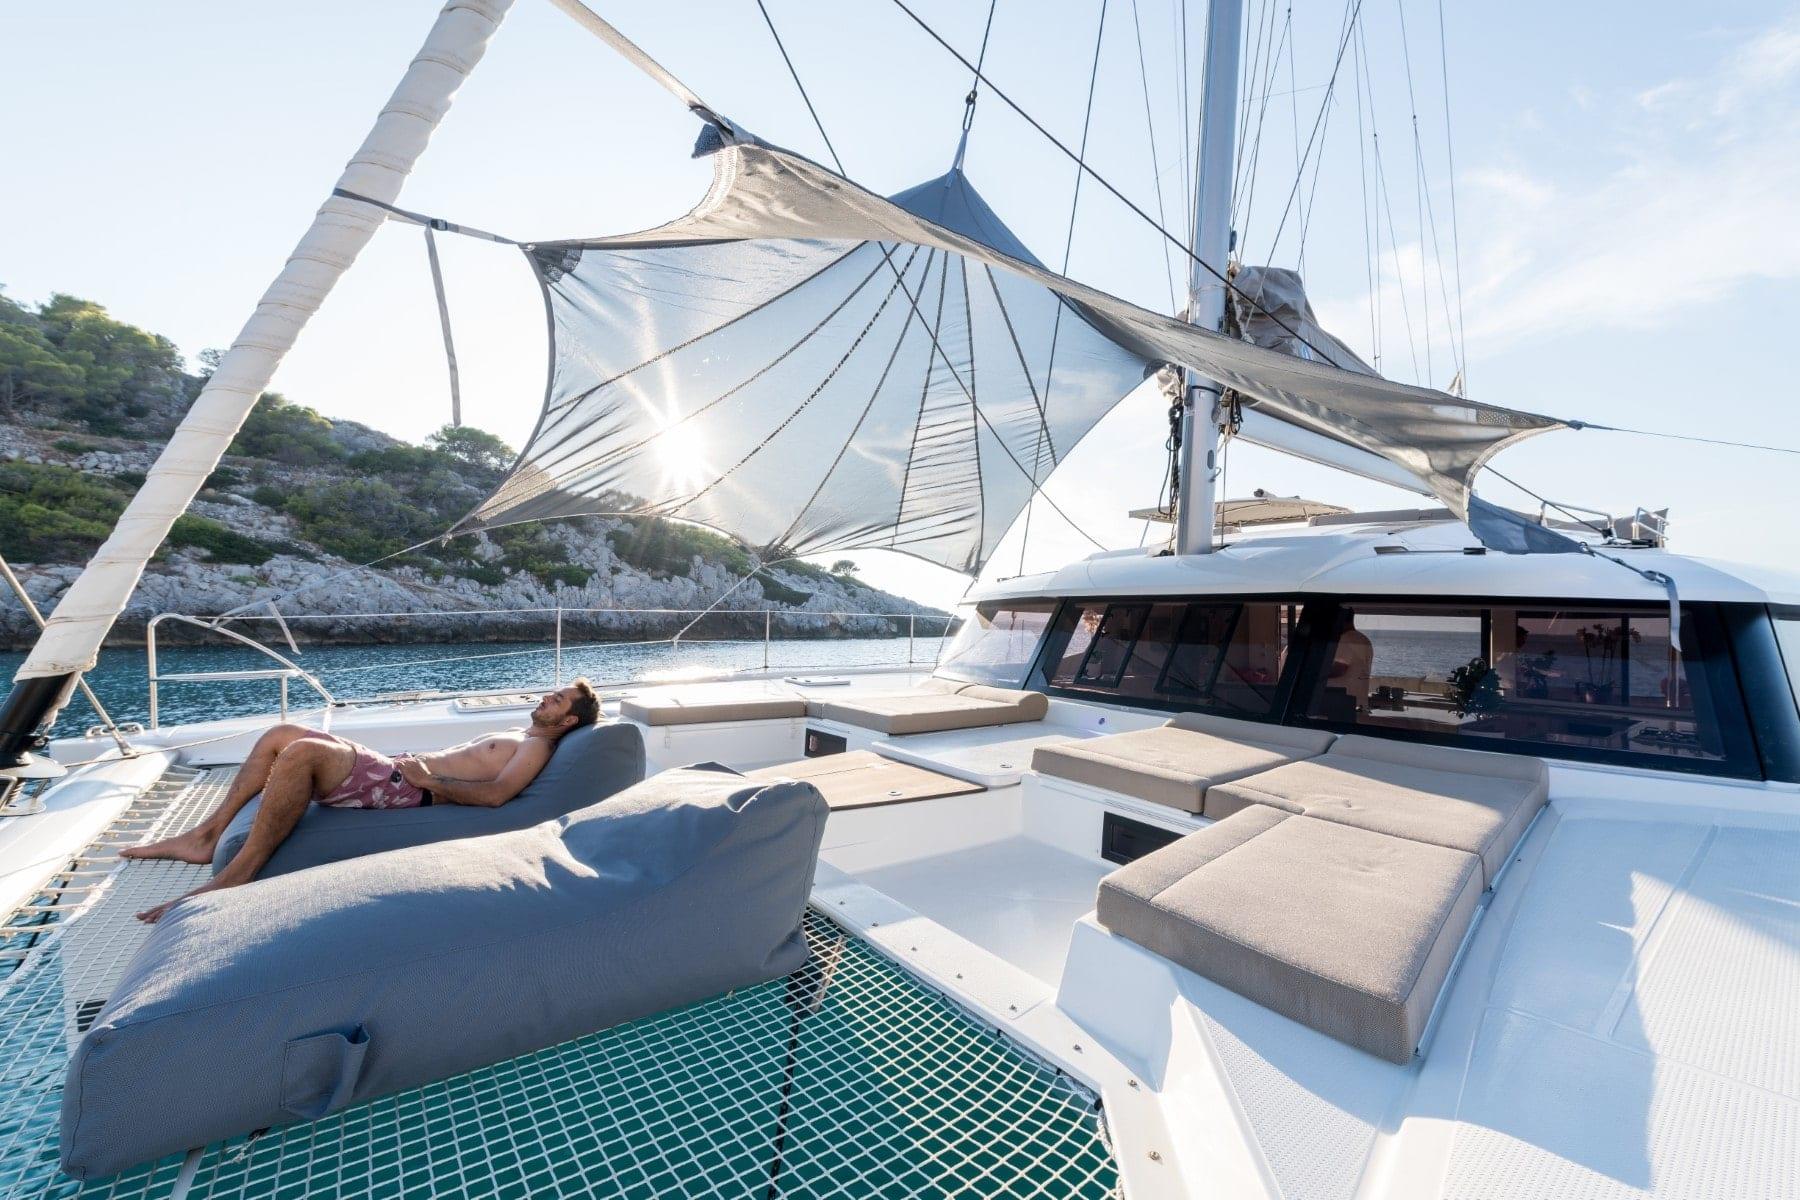 pi2 catamaran lifestyle day (1)  - Valef Yachts Chartering